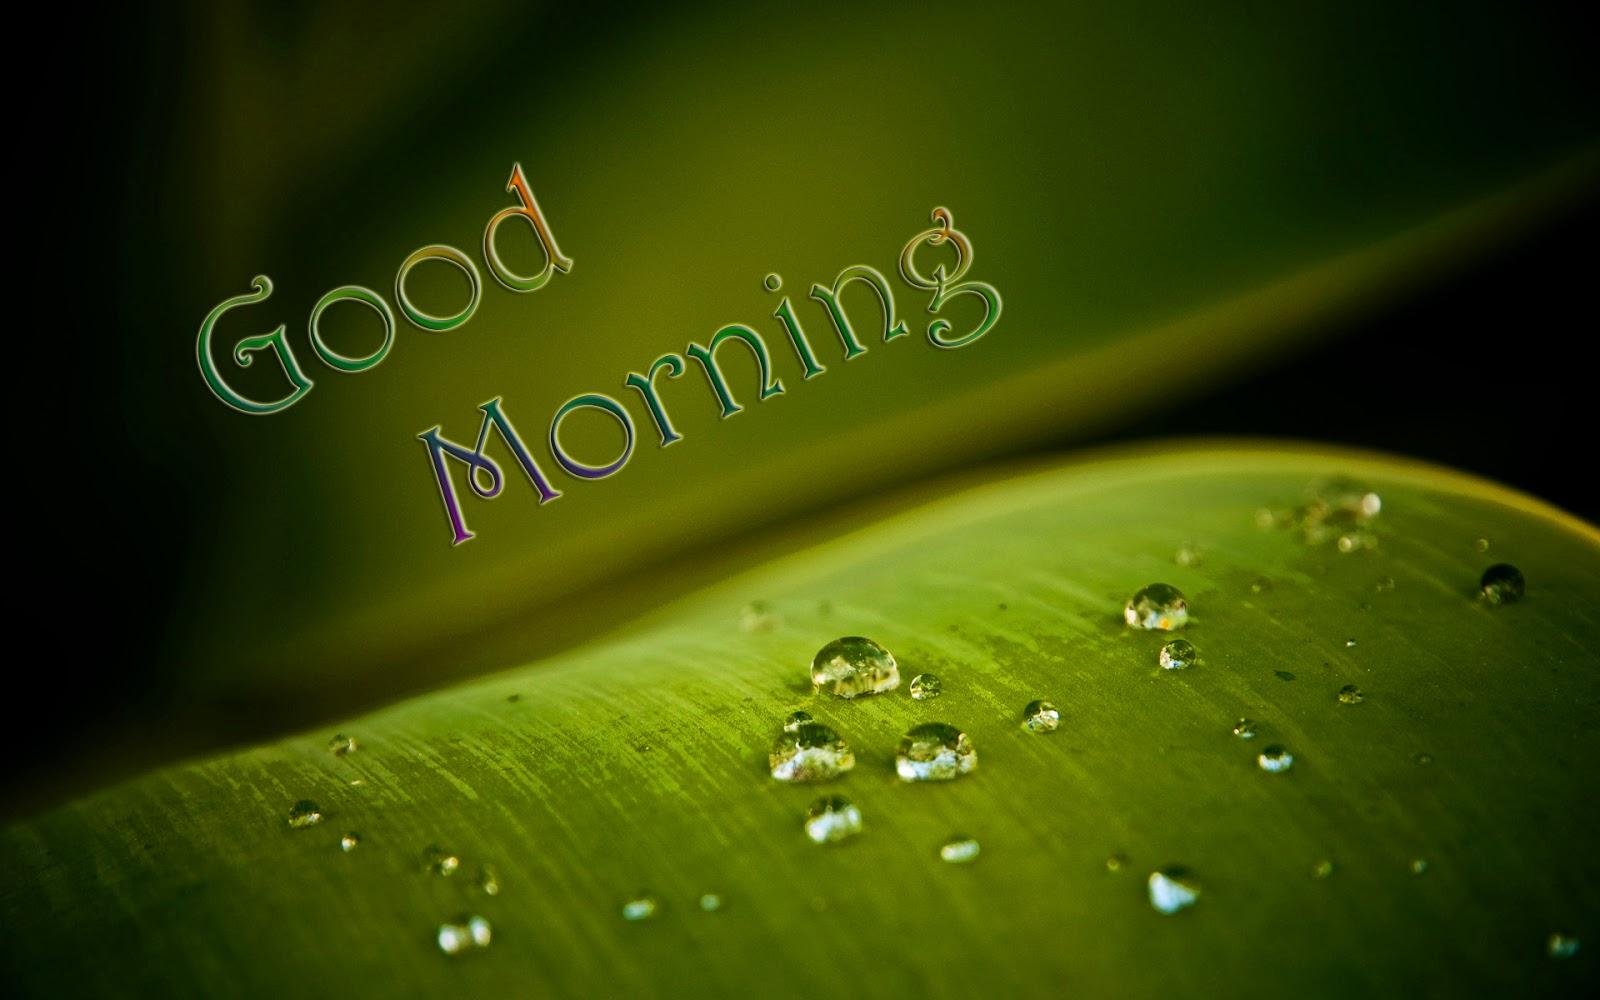 Hd wallpaper good morning - Wallpaper Good Morning